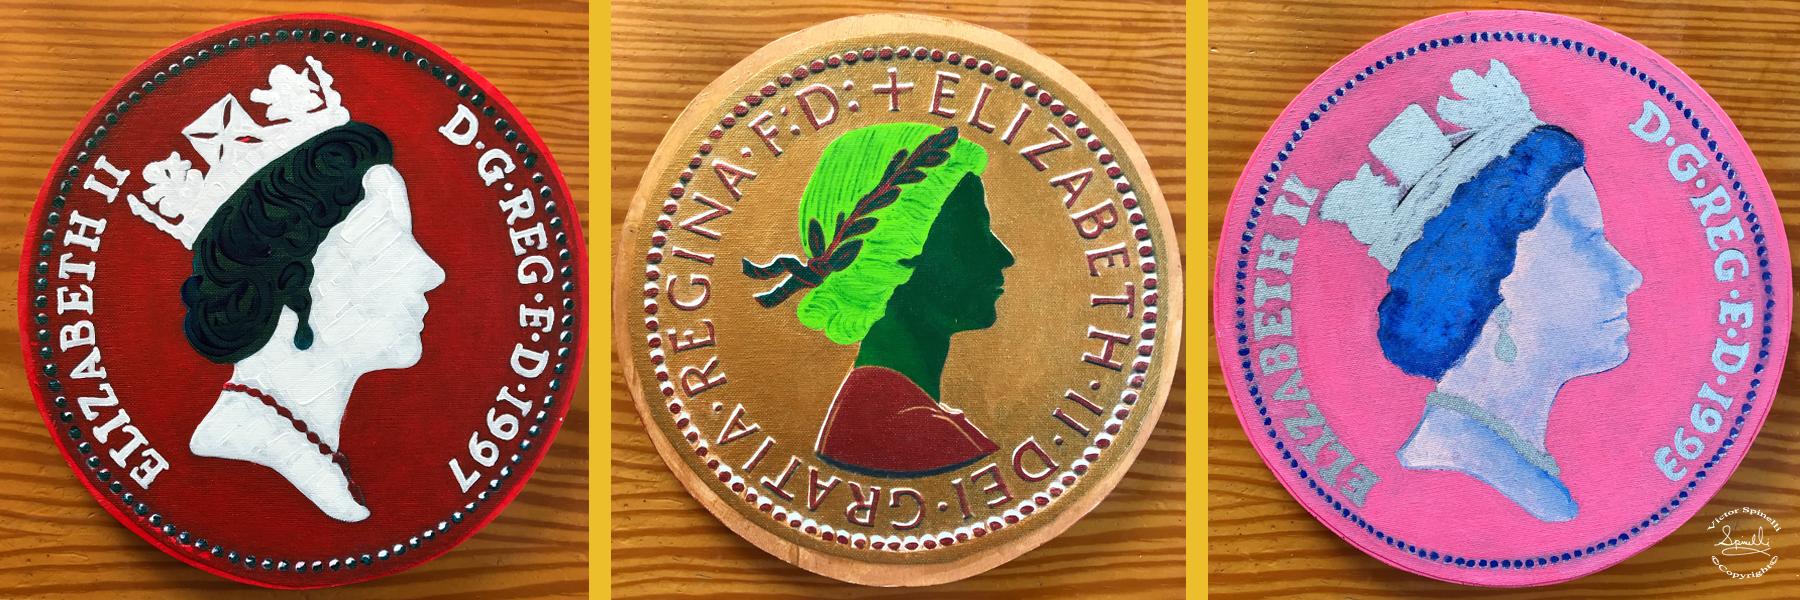 Victor Spinelli-Queens Mint-Queen Elizabeth-Royal Mint.png